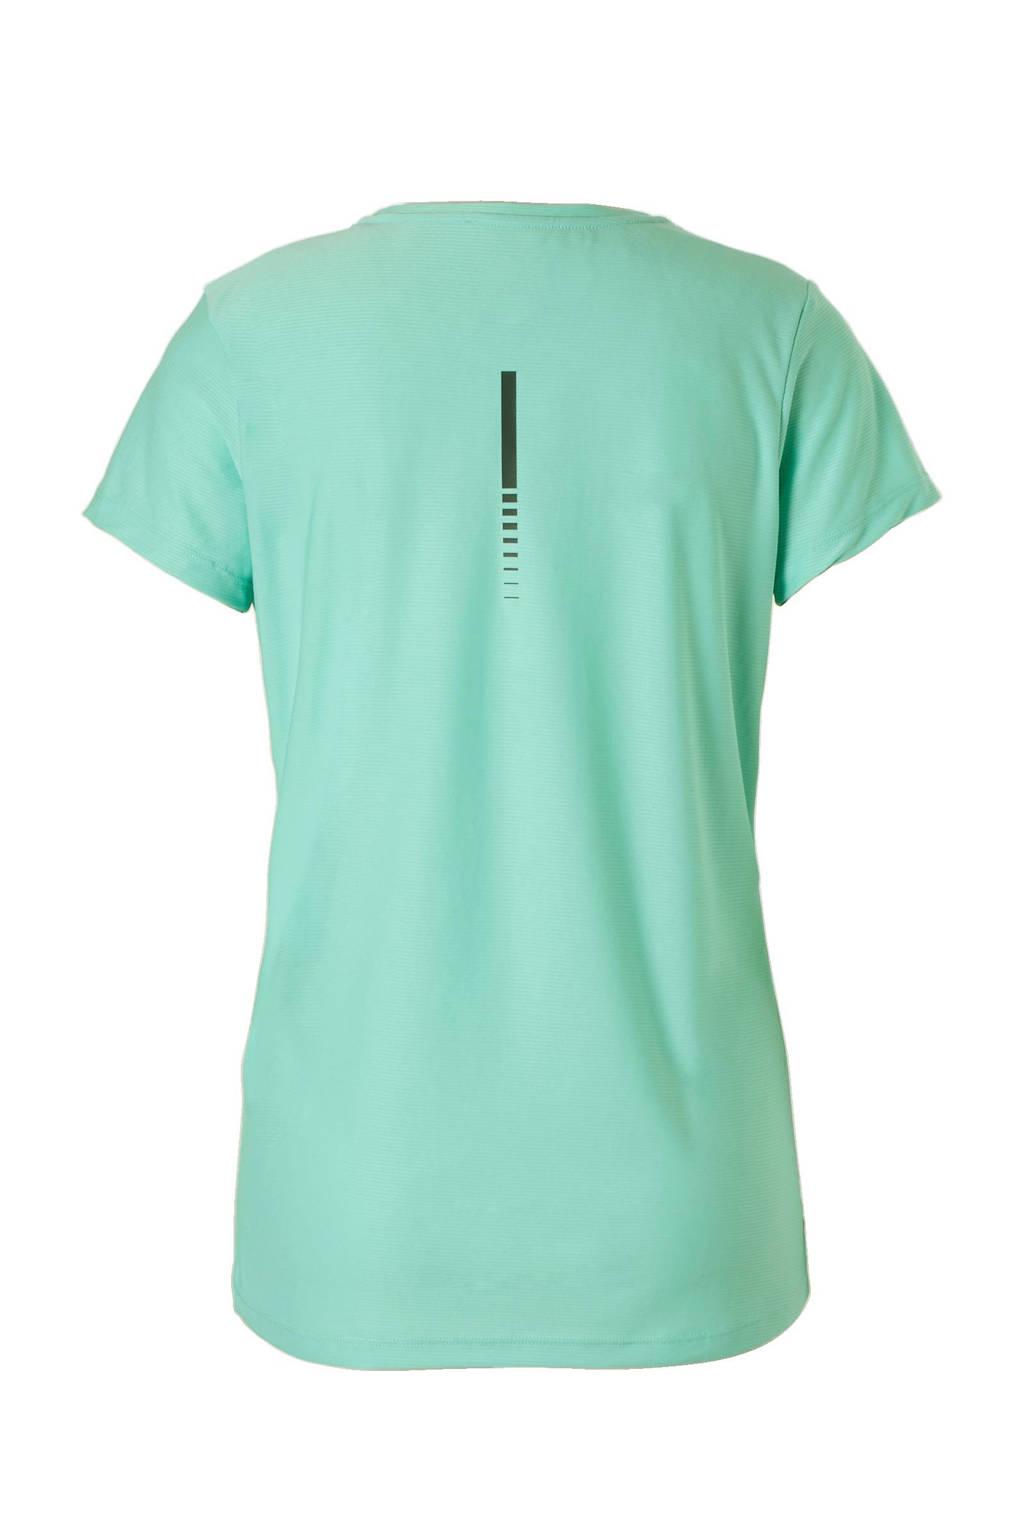 ASICS hardloop T-shirt, Mintgroen/grijs